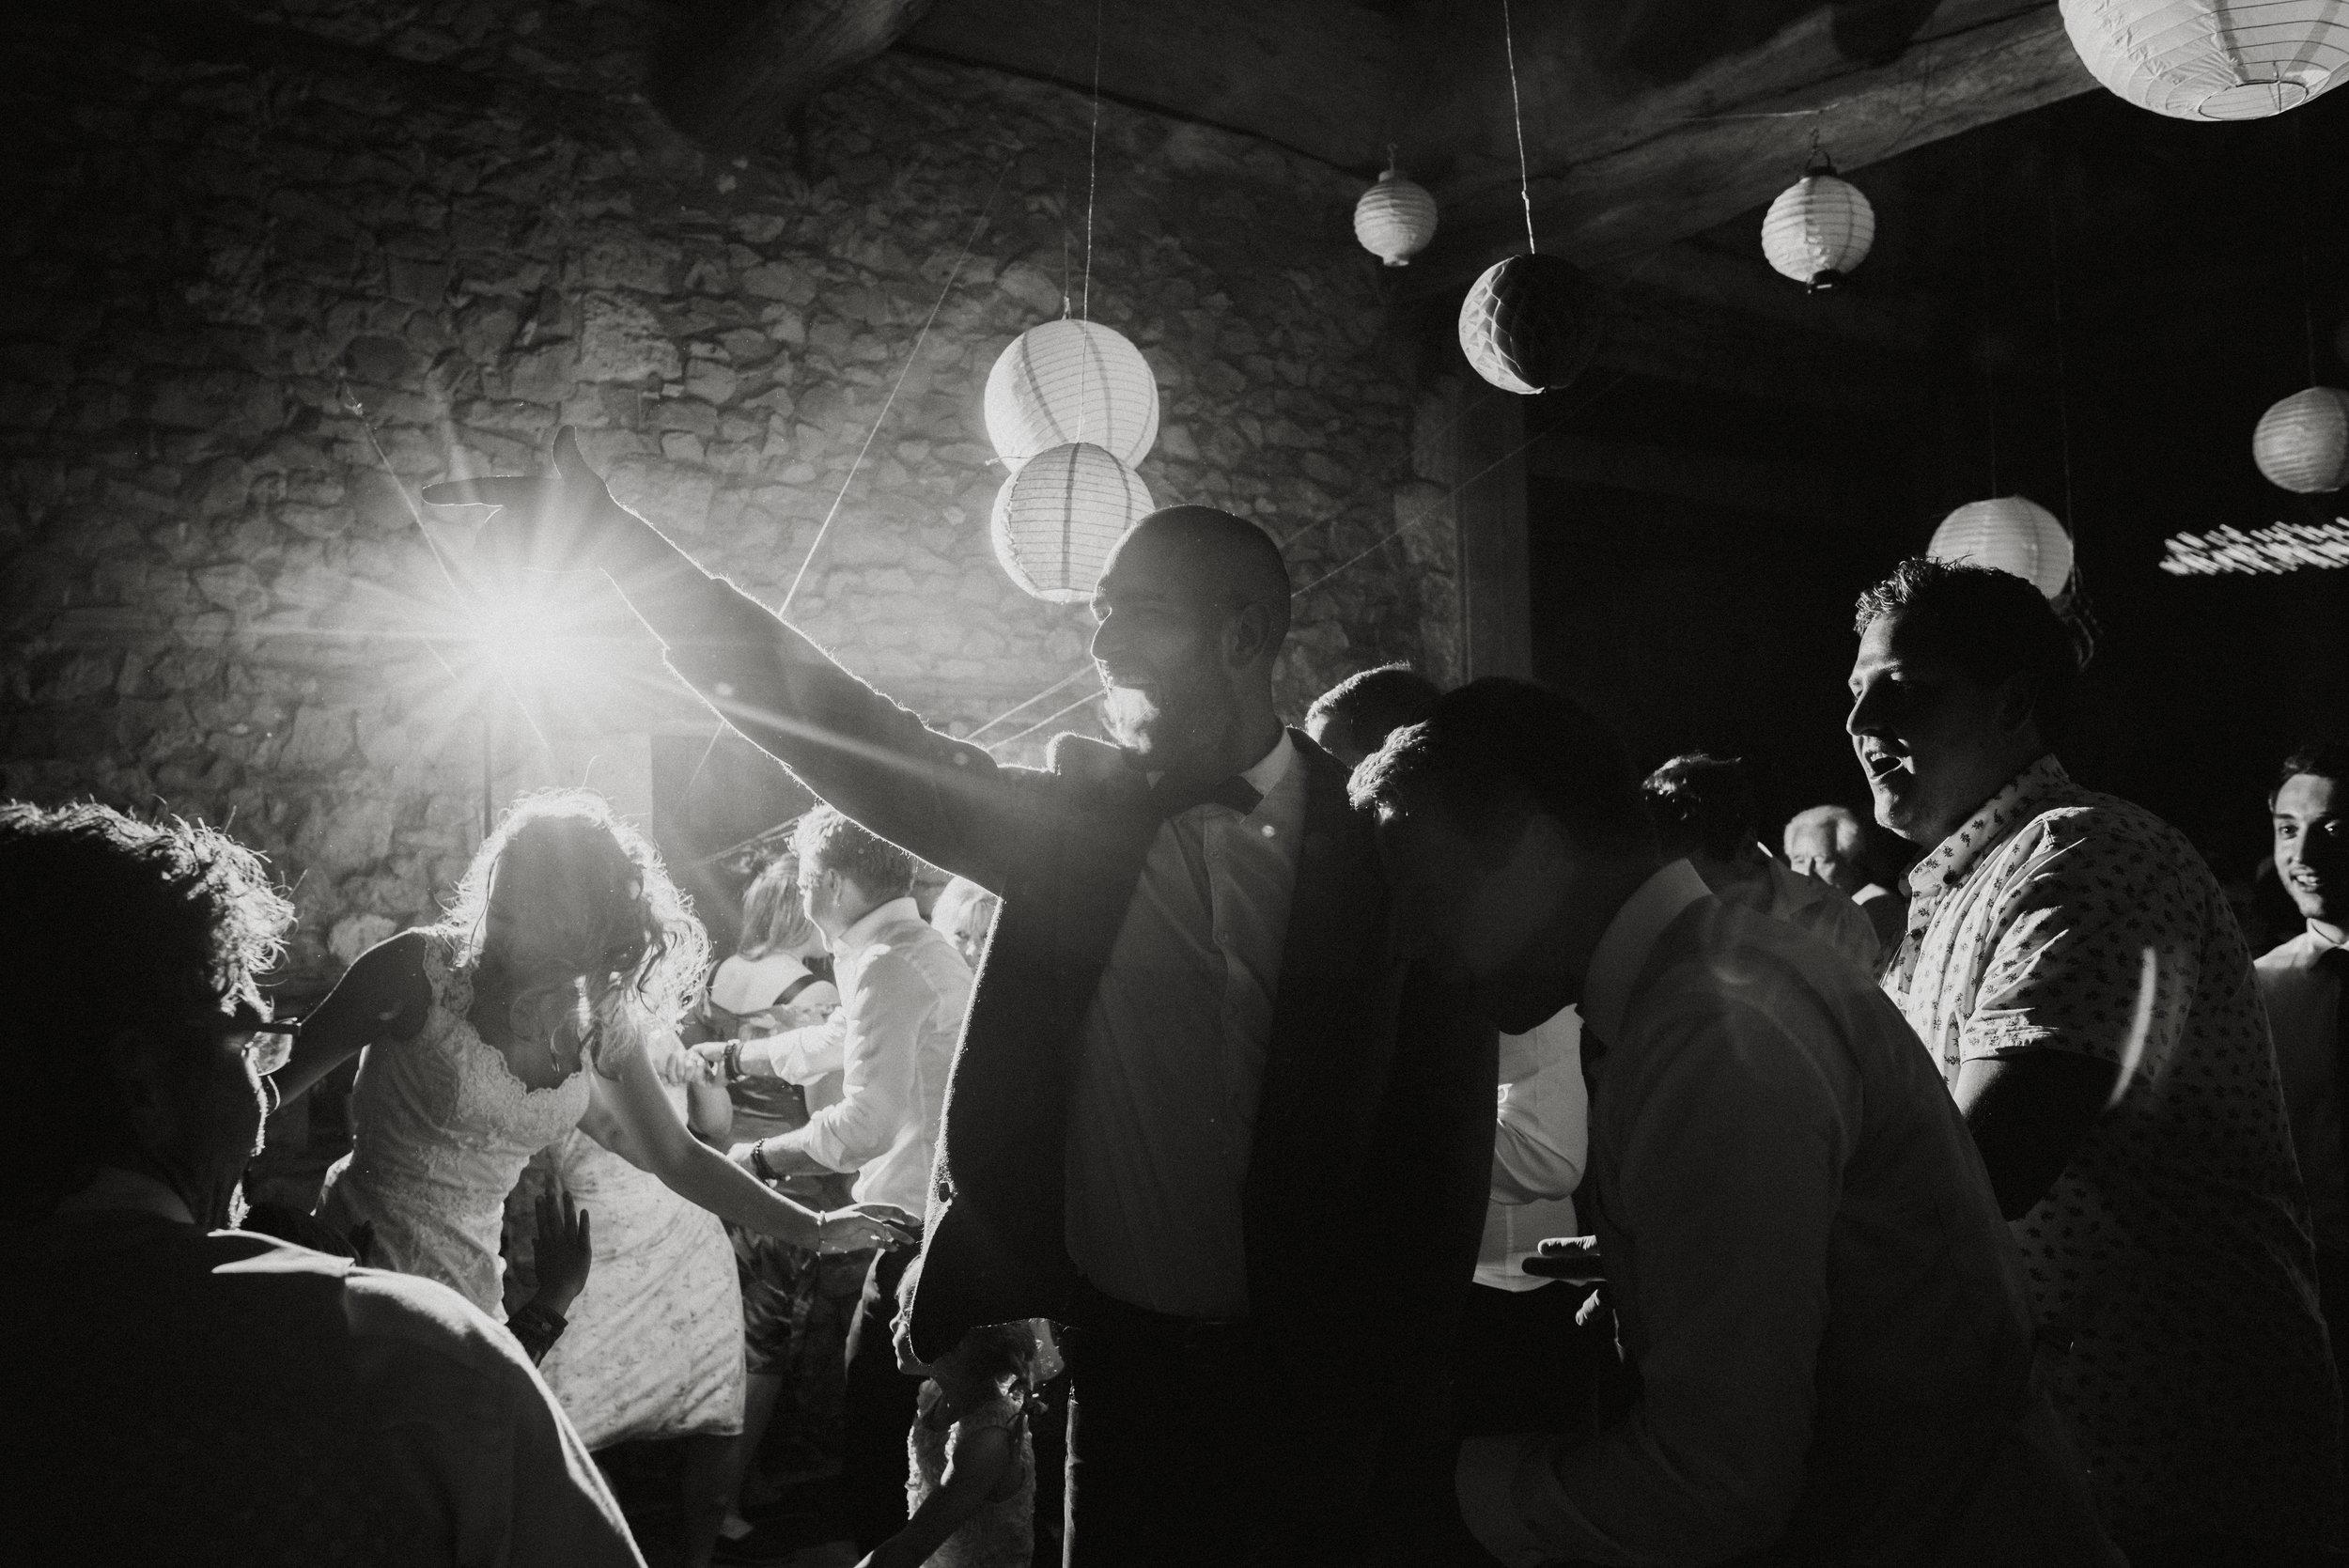 wedding-photographer-dordogne-mark-shaw-77.jpg